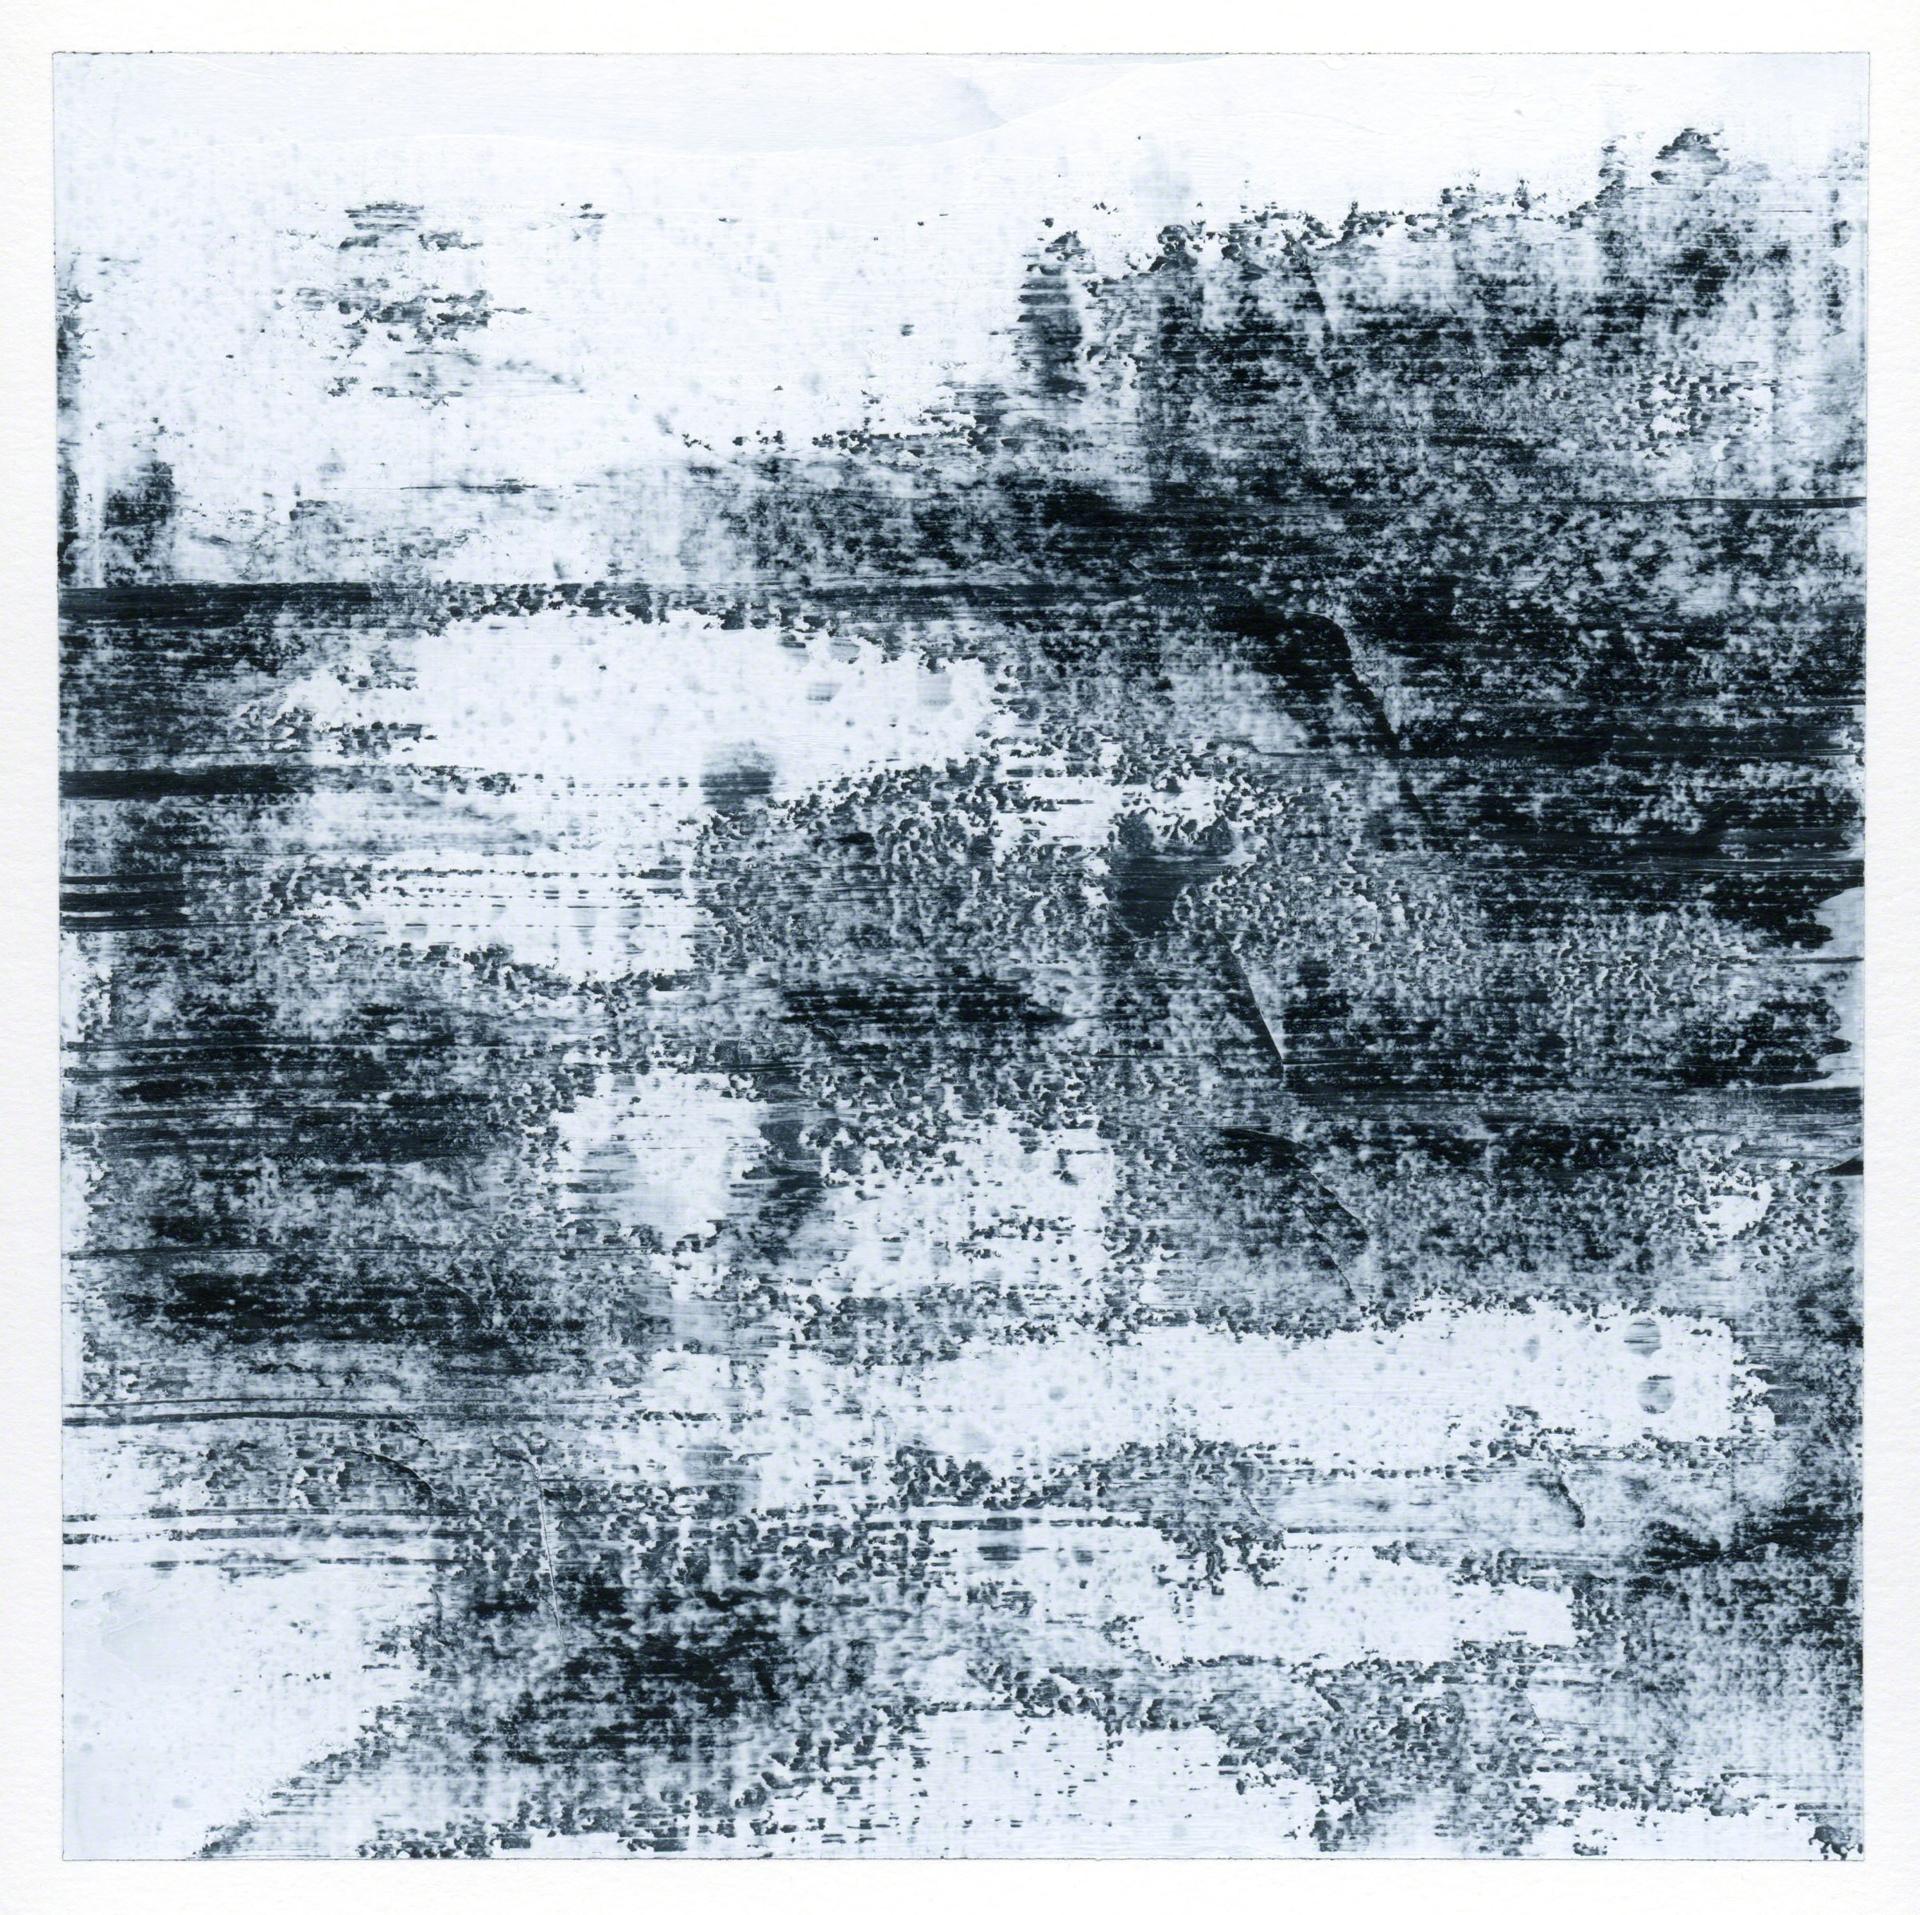 Untitled (17.10.19) by Paul Moran